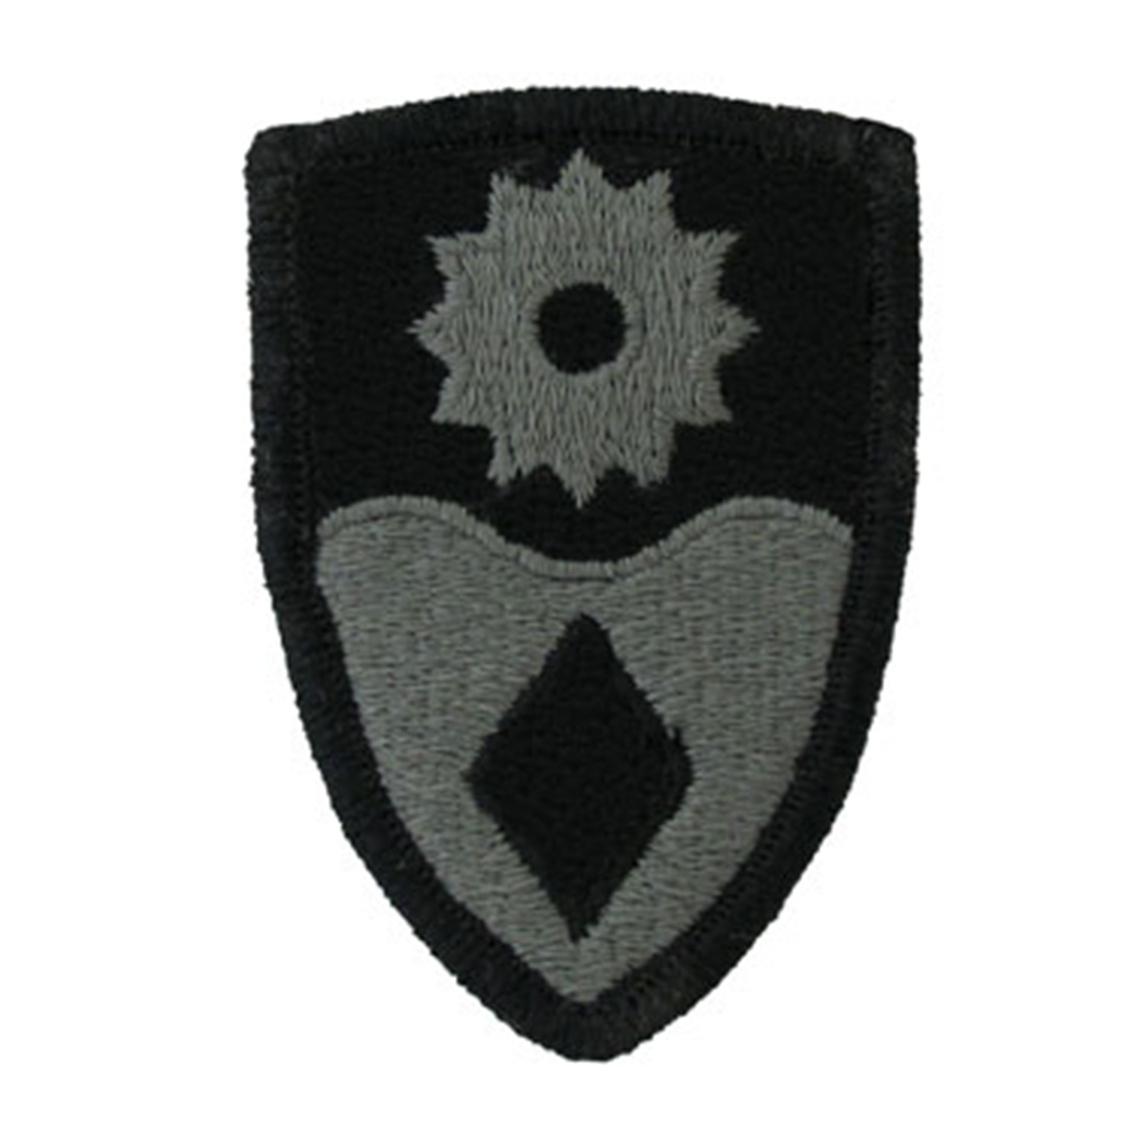 49th MP Military Police Brigade ACU Patch ACU Army